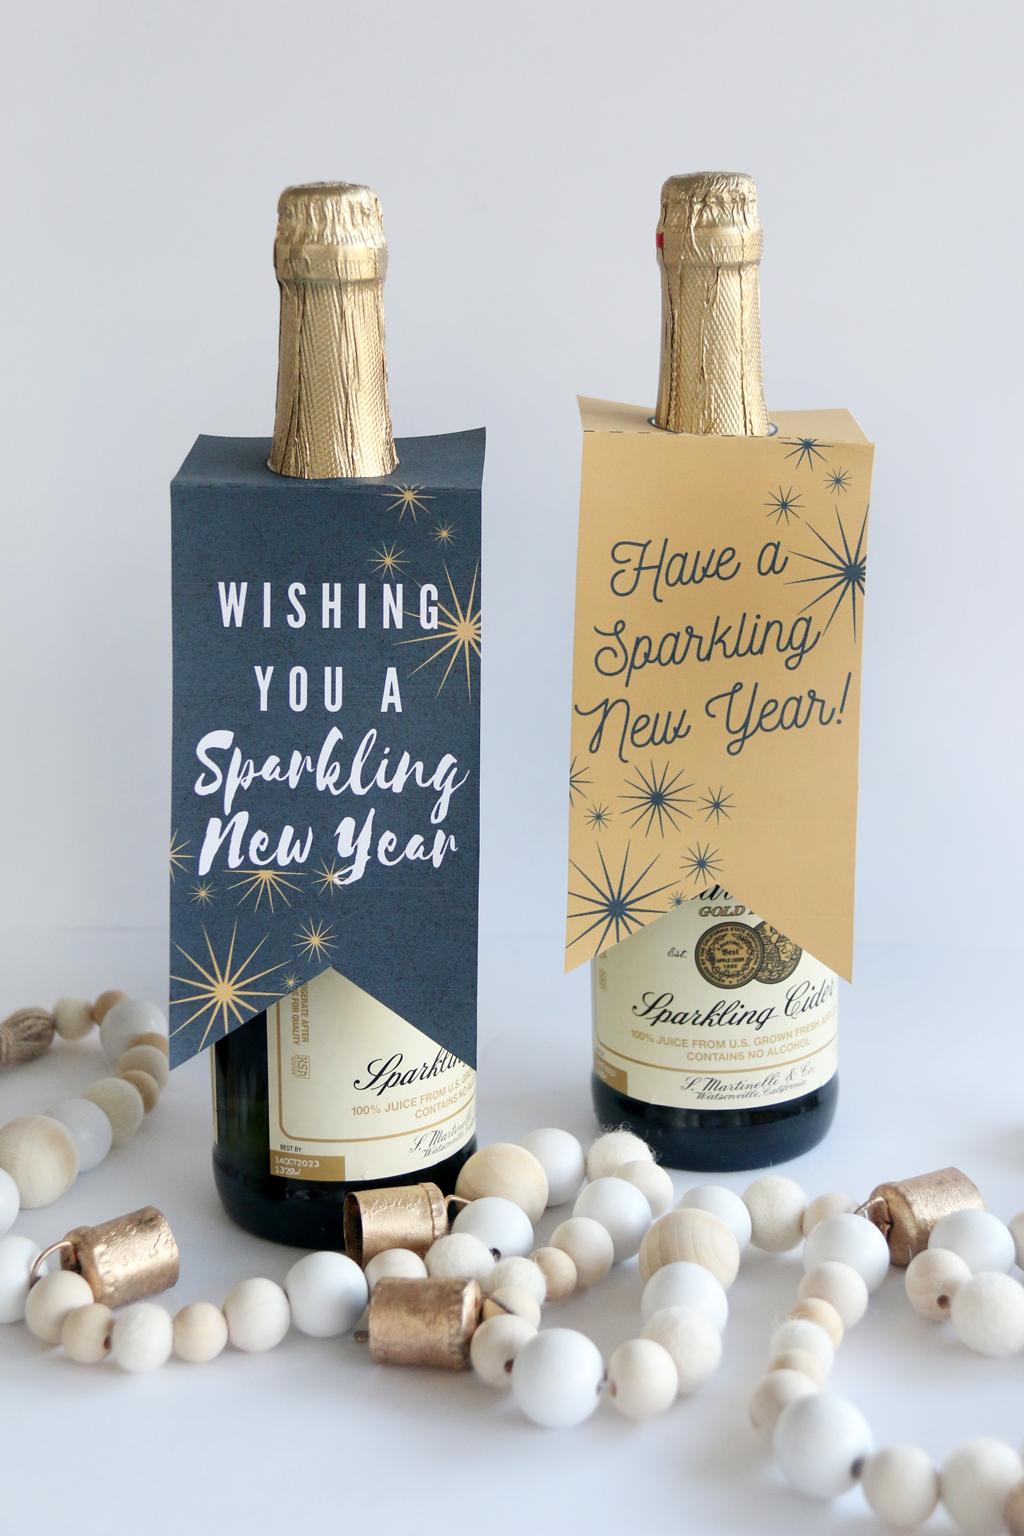 New Year Sparkling Cider Gift Tags on bottles of sparkling cider